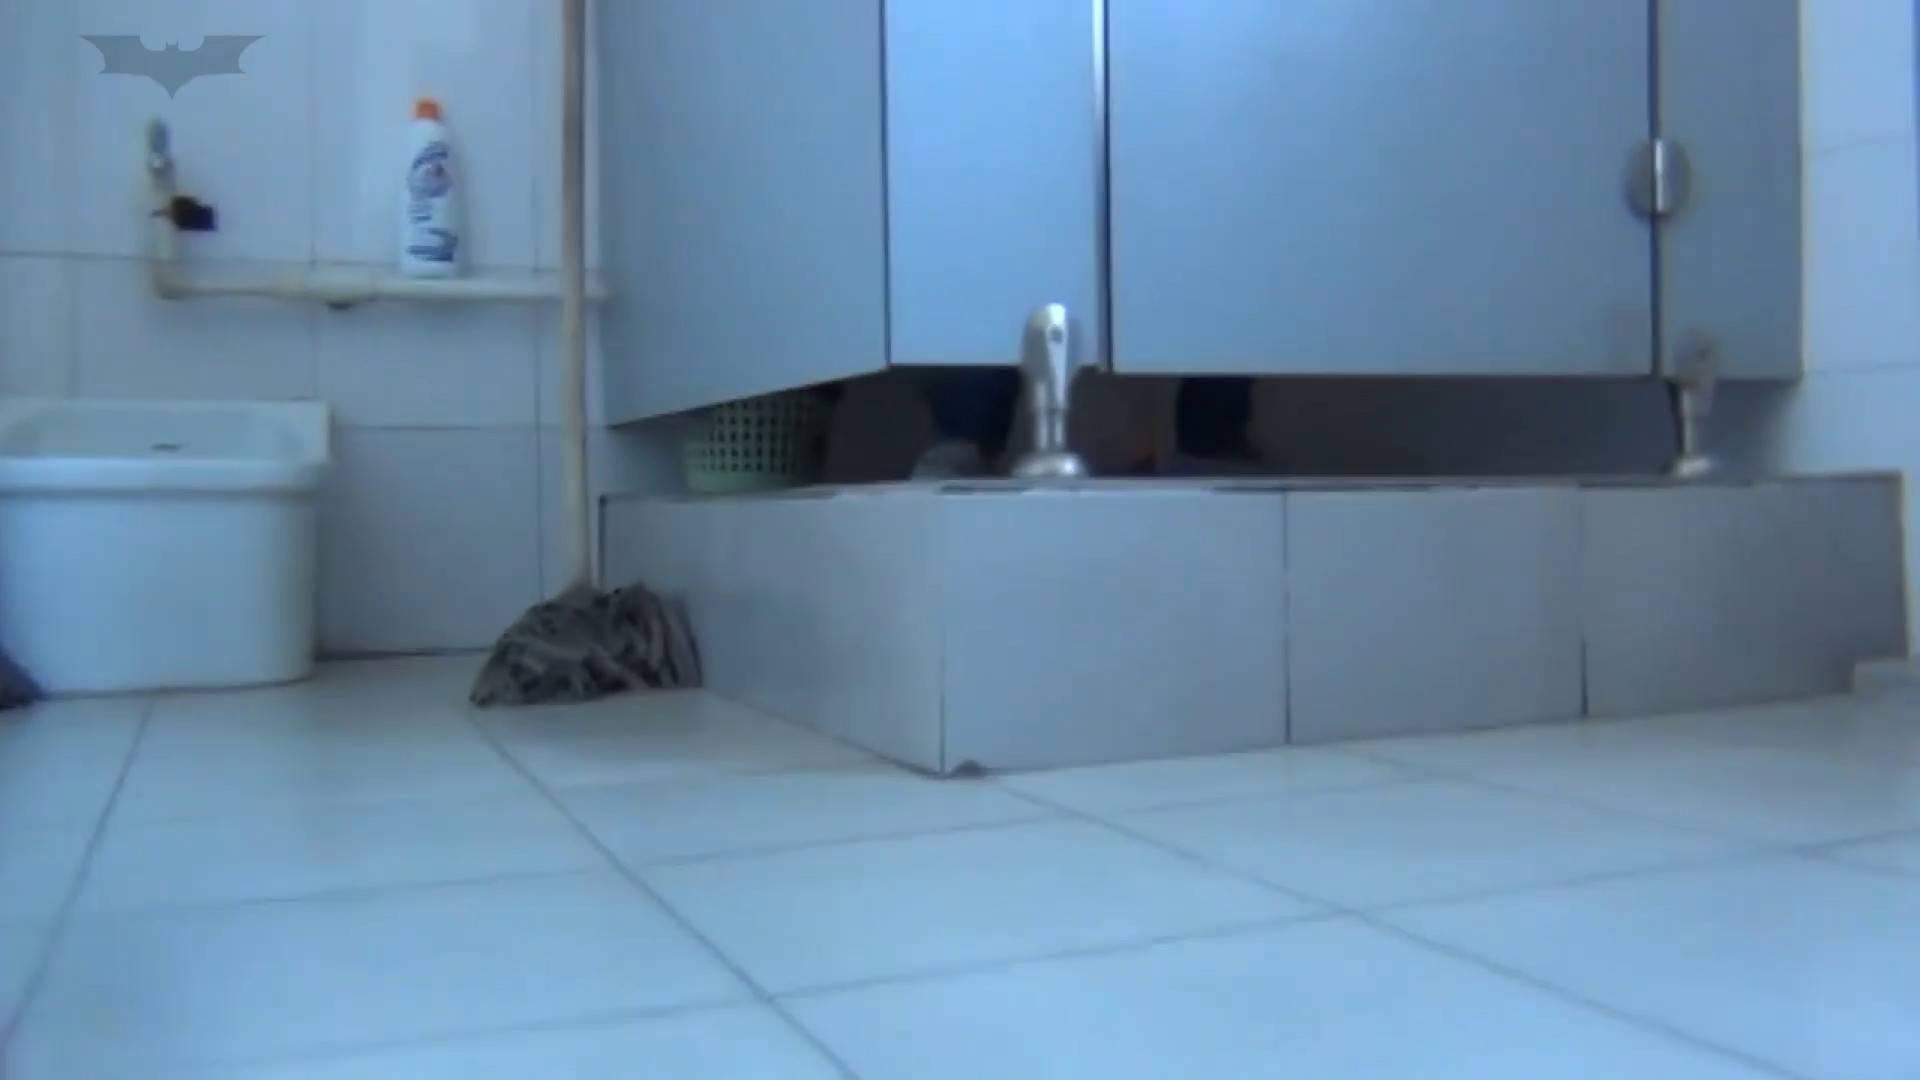 JD盗撮 美女の洗面所の秘密 Vol.23 美女 エロ無料画像 36画像 28